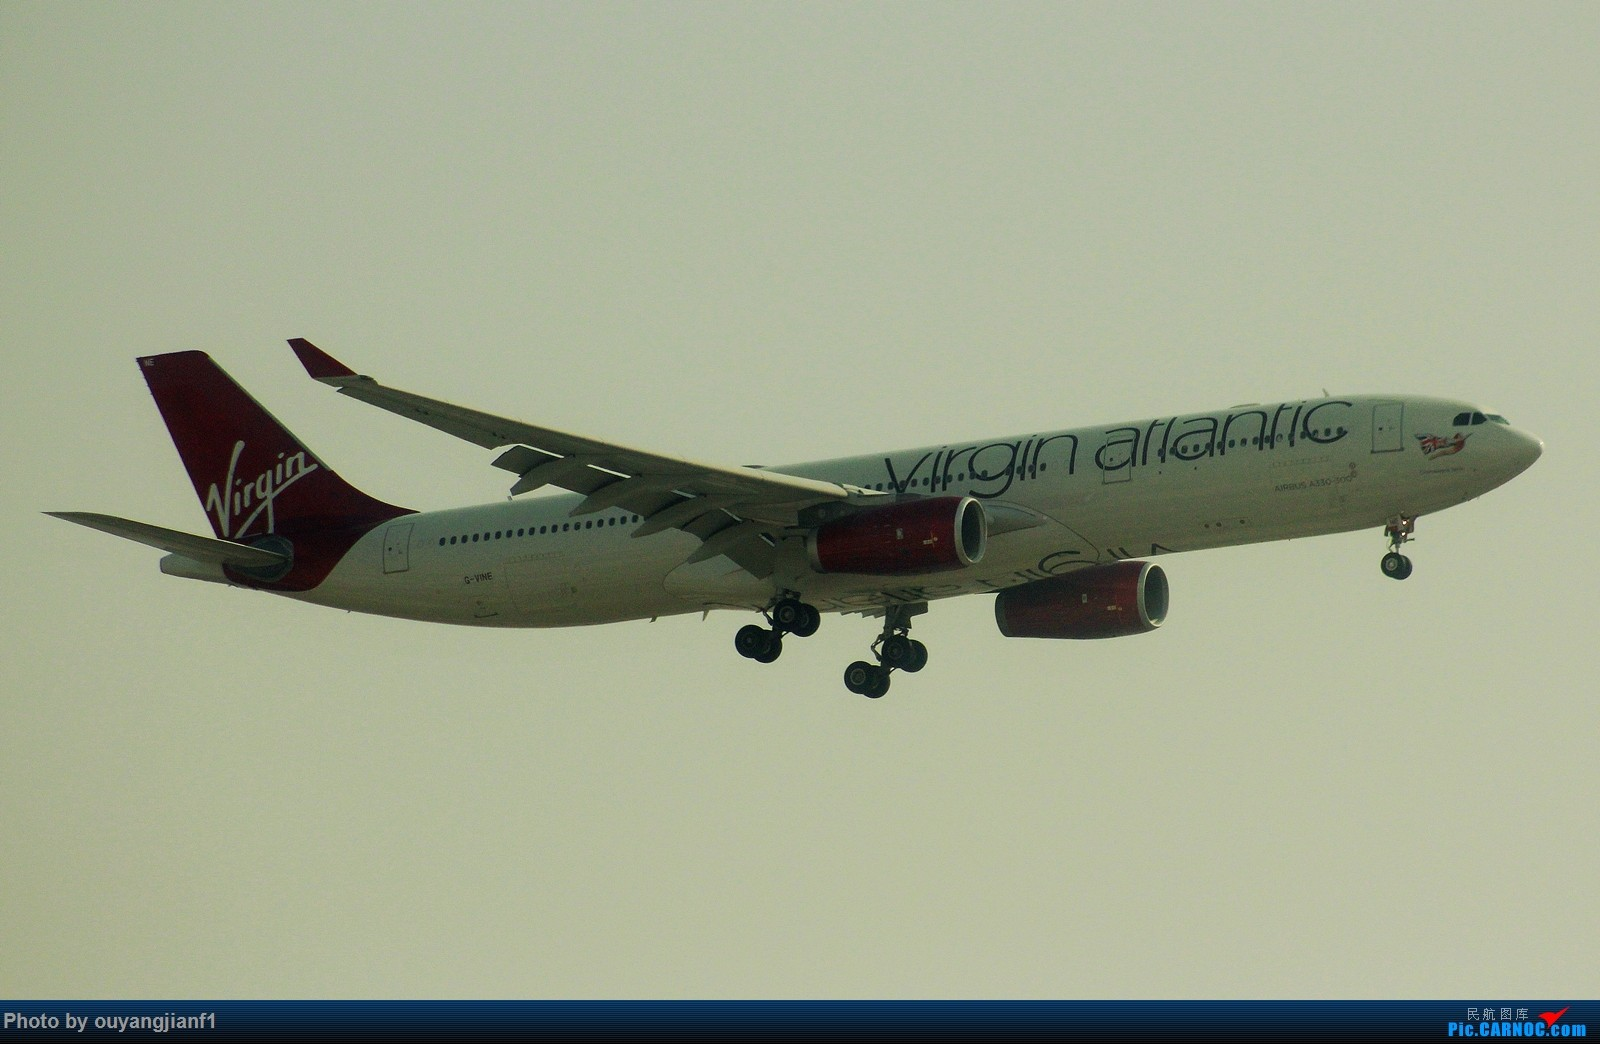 Re:[原创]很多年没有来贴图区了,记一次本不在计划中的迪拜拍机之行,在漫天黄沙中EK的380和777真的看到吐血.... AIRBUS A330-300 G-VINE 阿拉伯联合酋长国迪拜国际机场